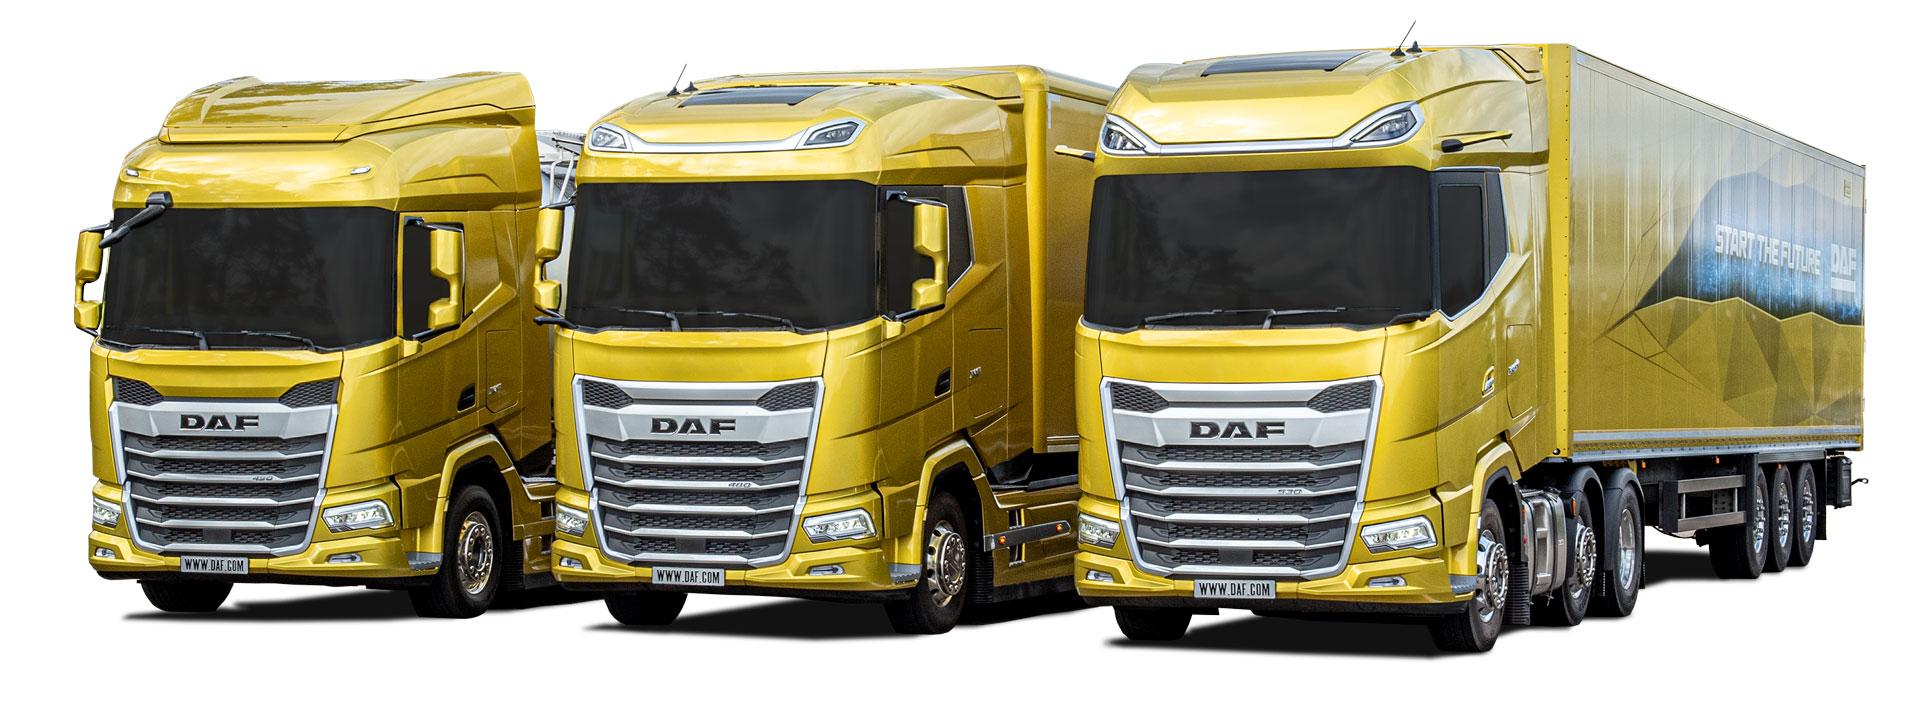 Nuova generazione di veicoli DAF